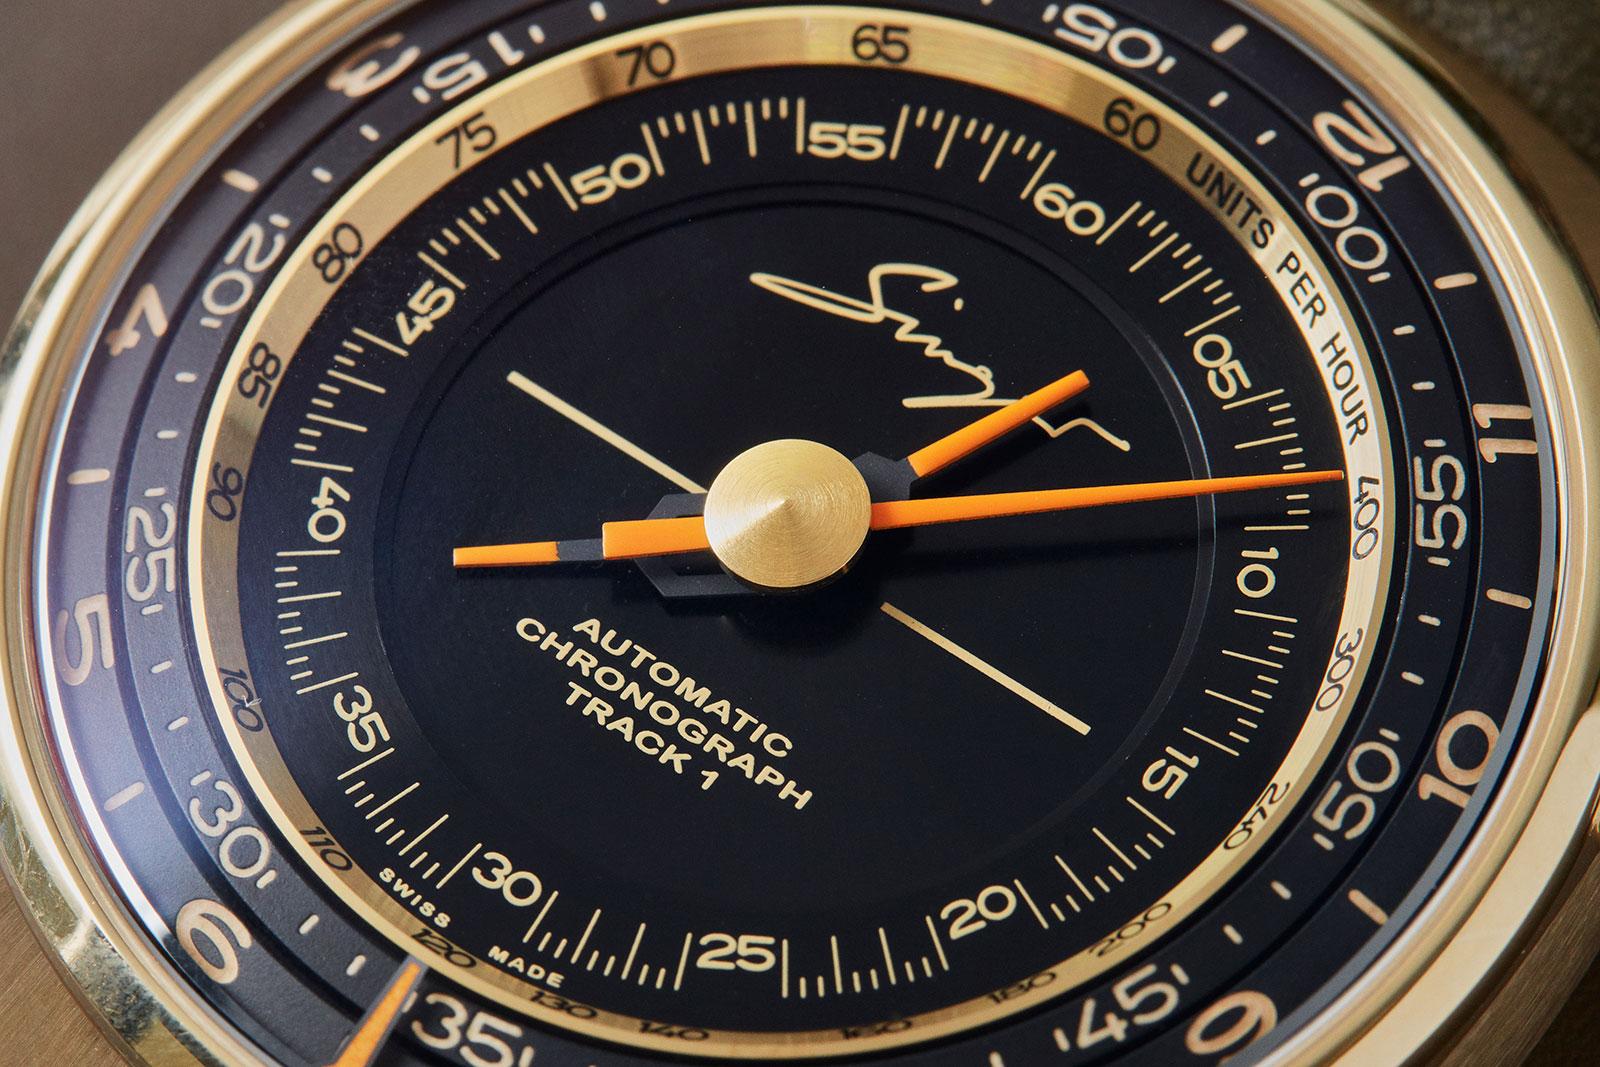 Singer Track 1 Geneva Edition gold chronograph 5